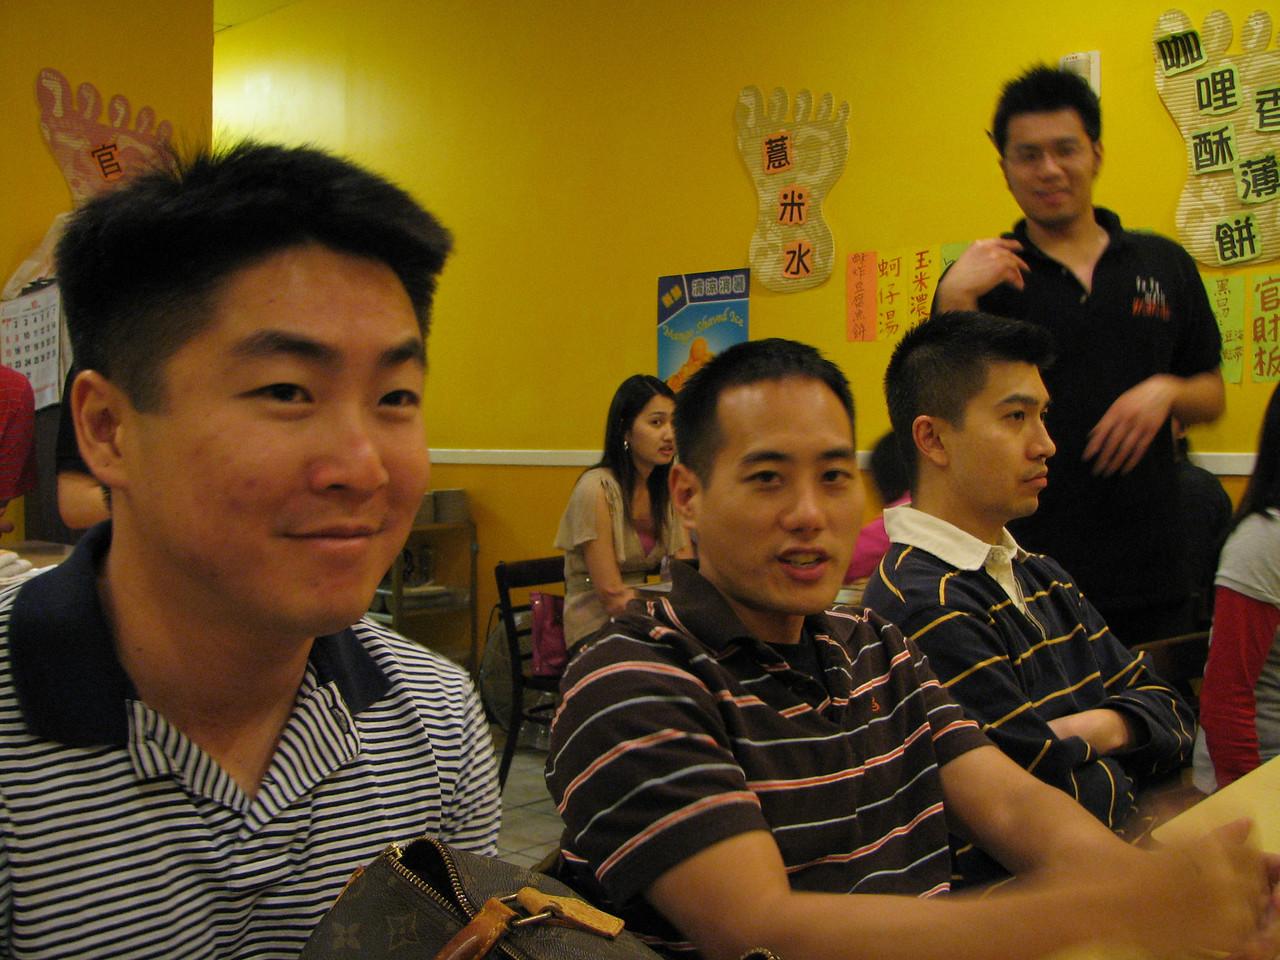 2006 10 29 Sun - Dean Chang & his LV purse, Jimmy Chen & his live in partner Yu-Tsun Cheng 1